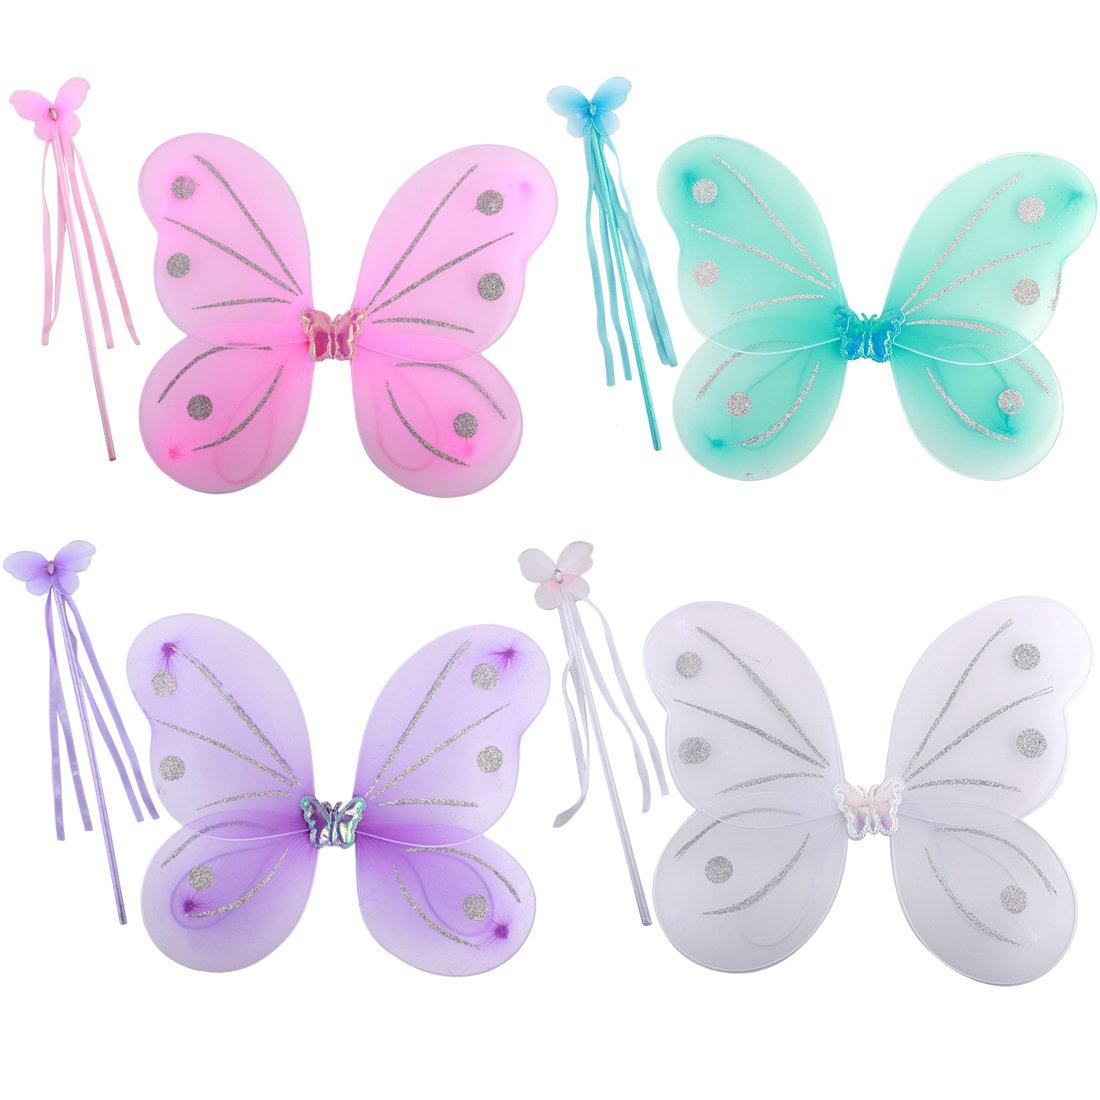 kilofly 4 Sets Princess Party Favor Jewelry Fairy Costume Dress up Role Play